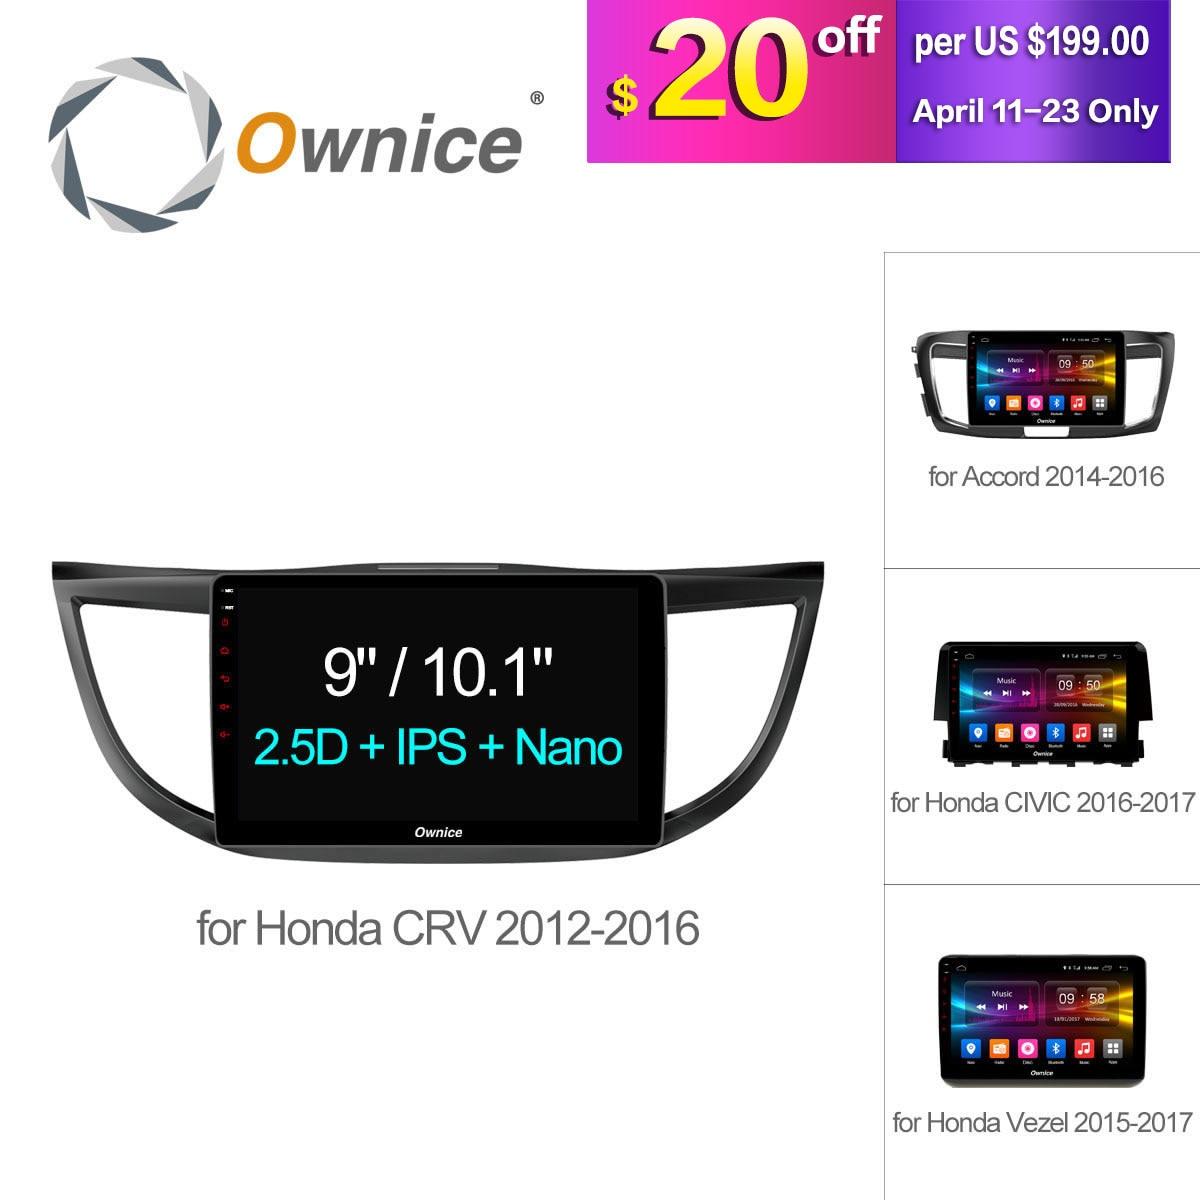 Ownice C500+ 10.1 HD Android 6.0 Octa 8 Core  Car radio player GPS Navi for HONDA 2012 - 2016 2017 Vezel CIVIC Accord CRV 32G